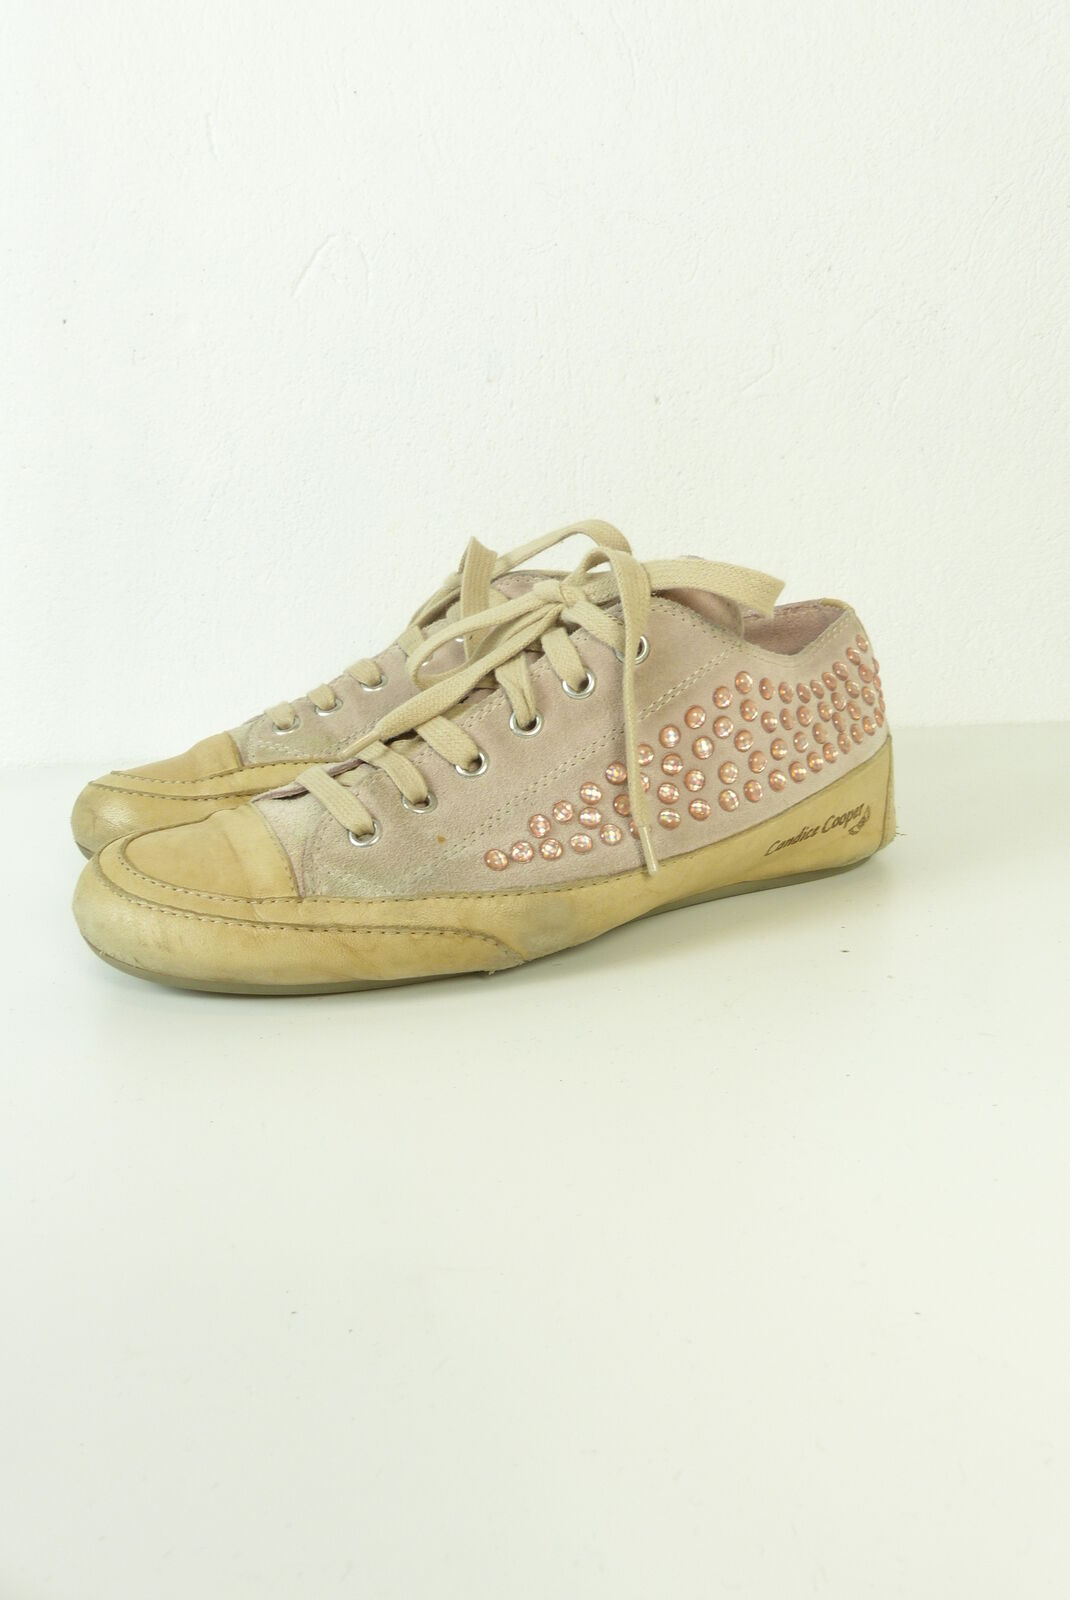 CANDICE COOPER Sneaker Turnschuhe Leder pink Steinchen Gr. (T48)